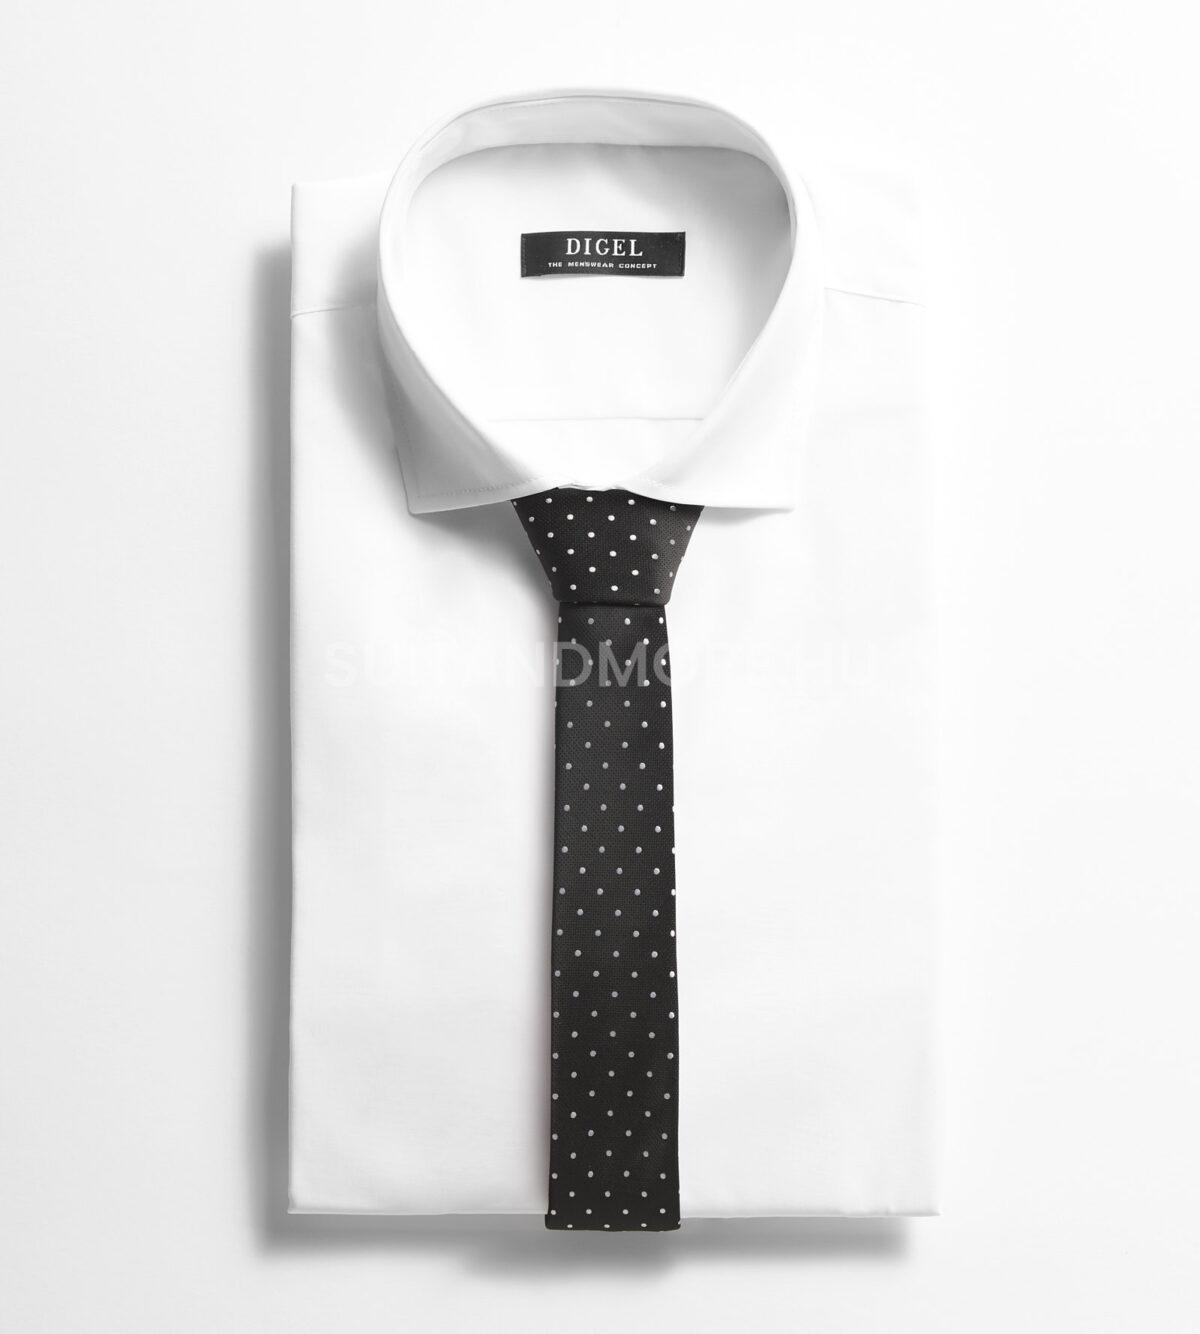 digel-fekete-pottyos-nyakkendo-gershwin-1199050-10-02